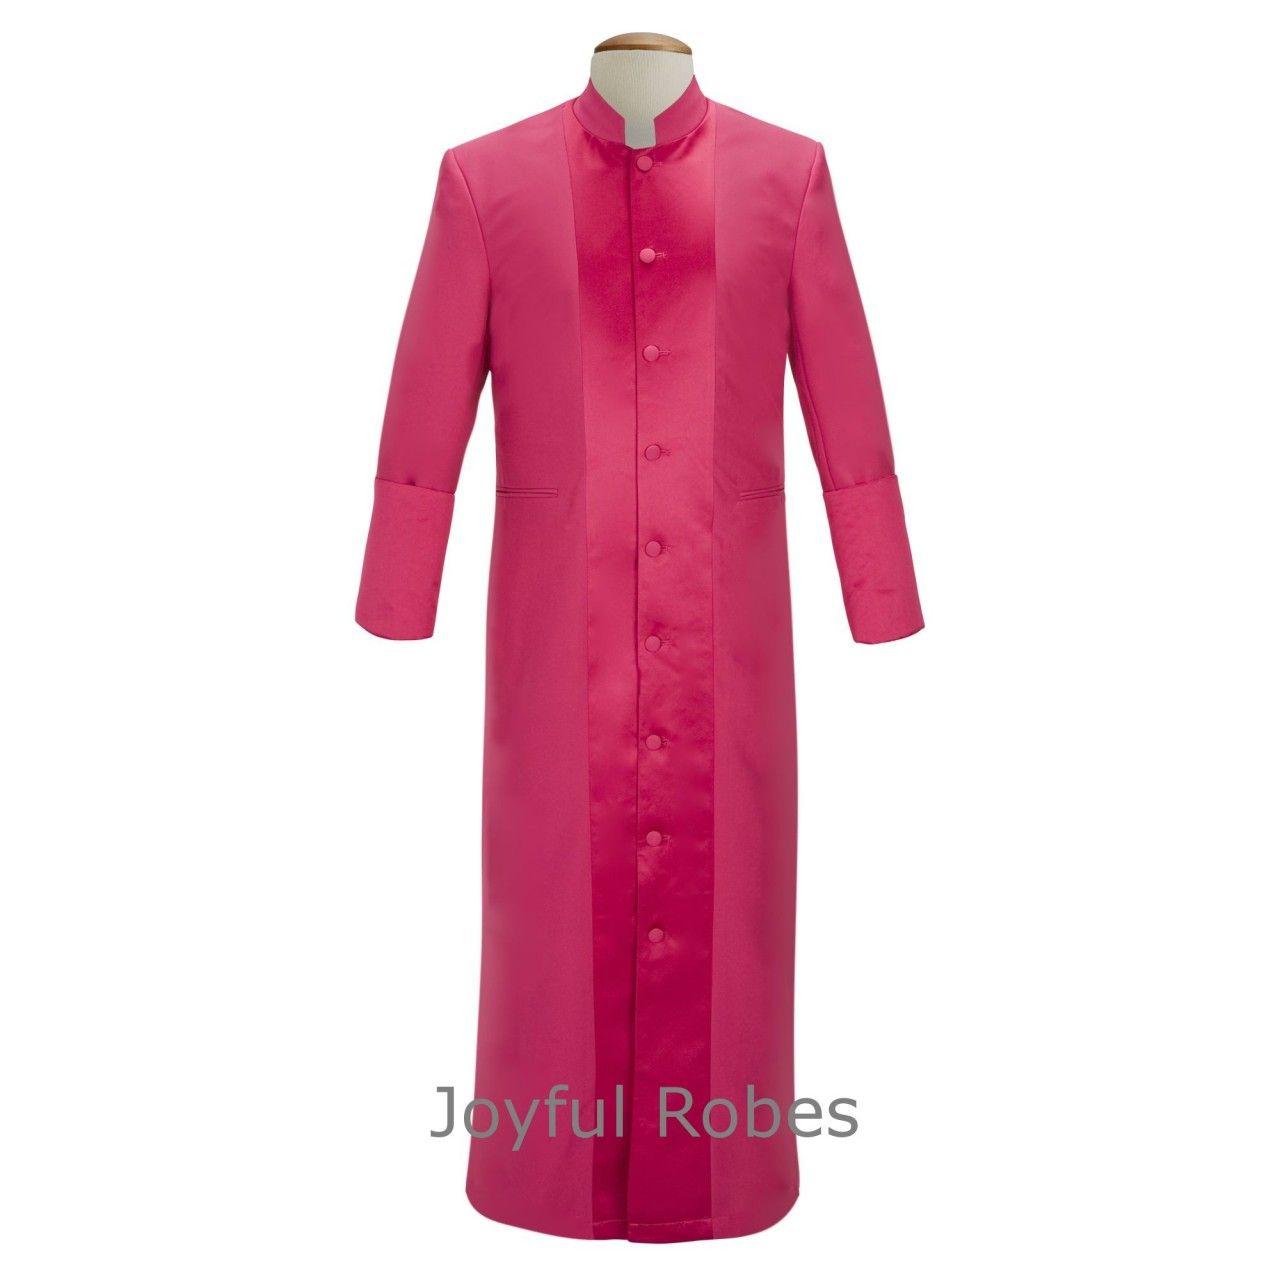 133 M. Men's Pastor/Clergy Robe Fuchsia With Majestic Satin